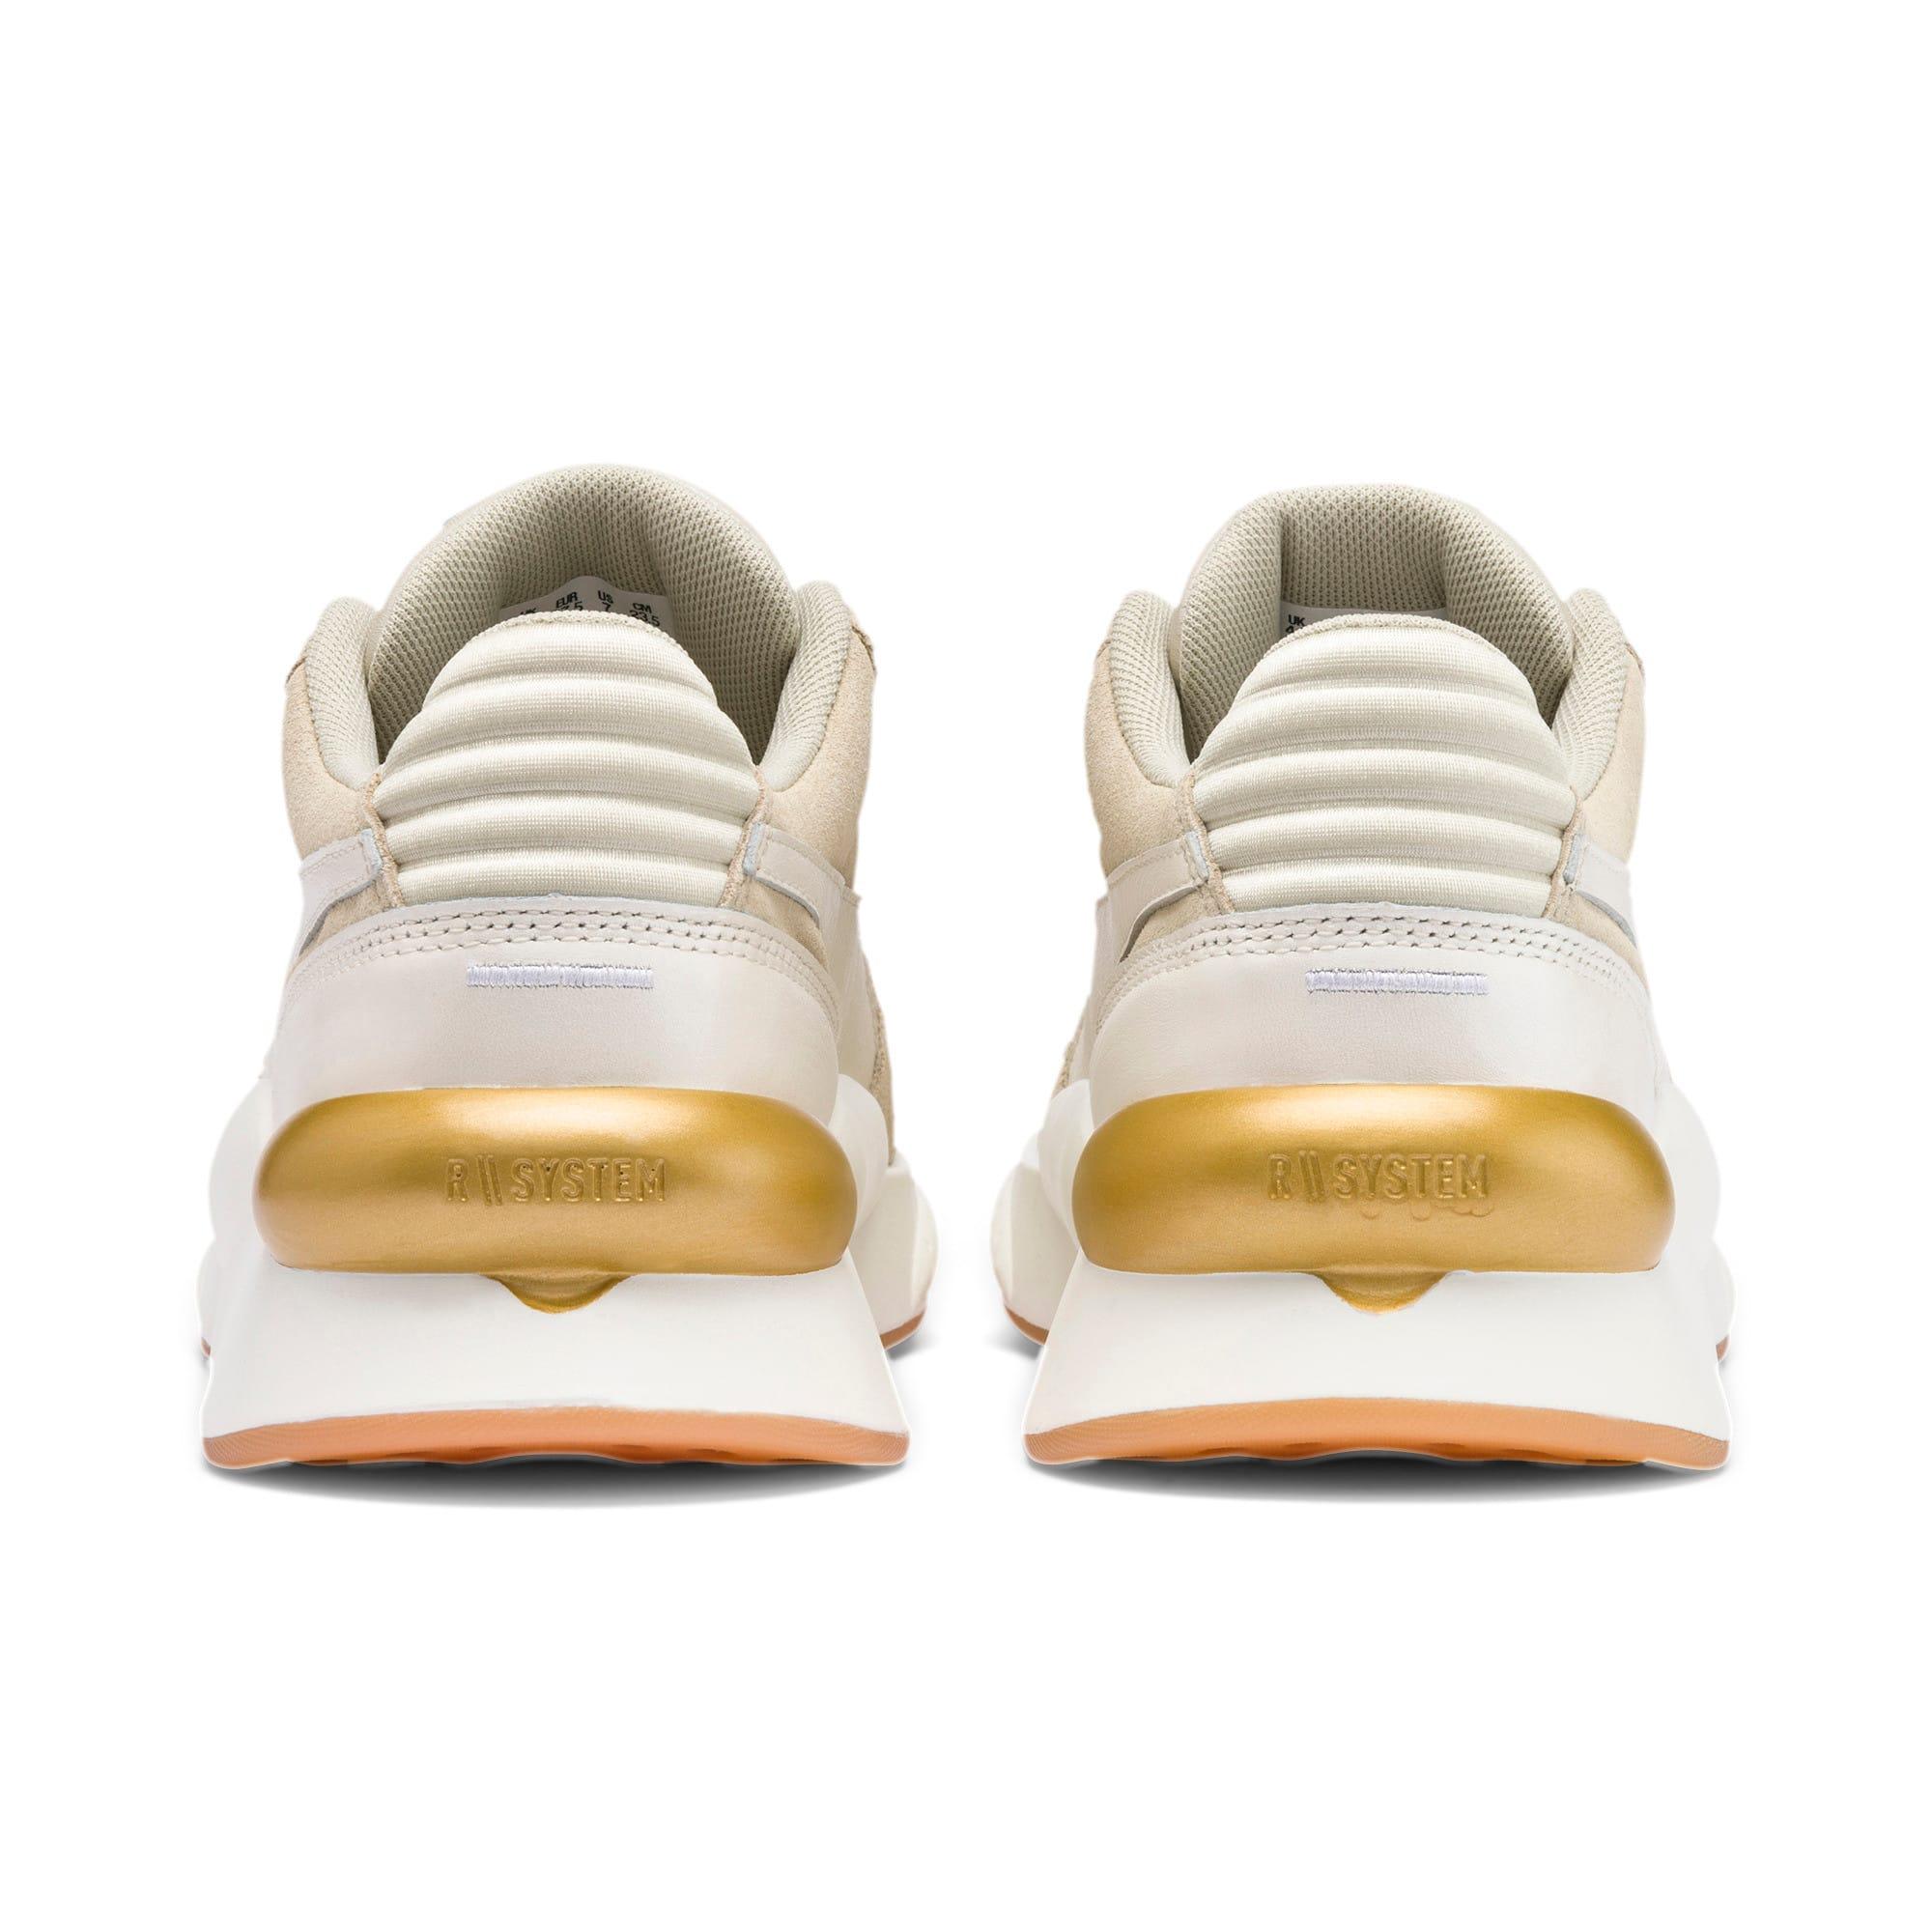 Thumbnail 4 of RS 9.8 Metallic Women's Sneakers, Overcast, medium